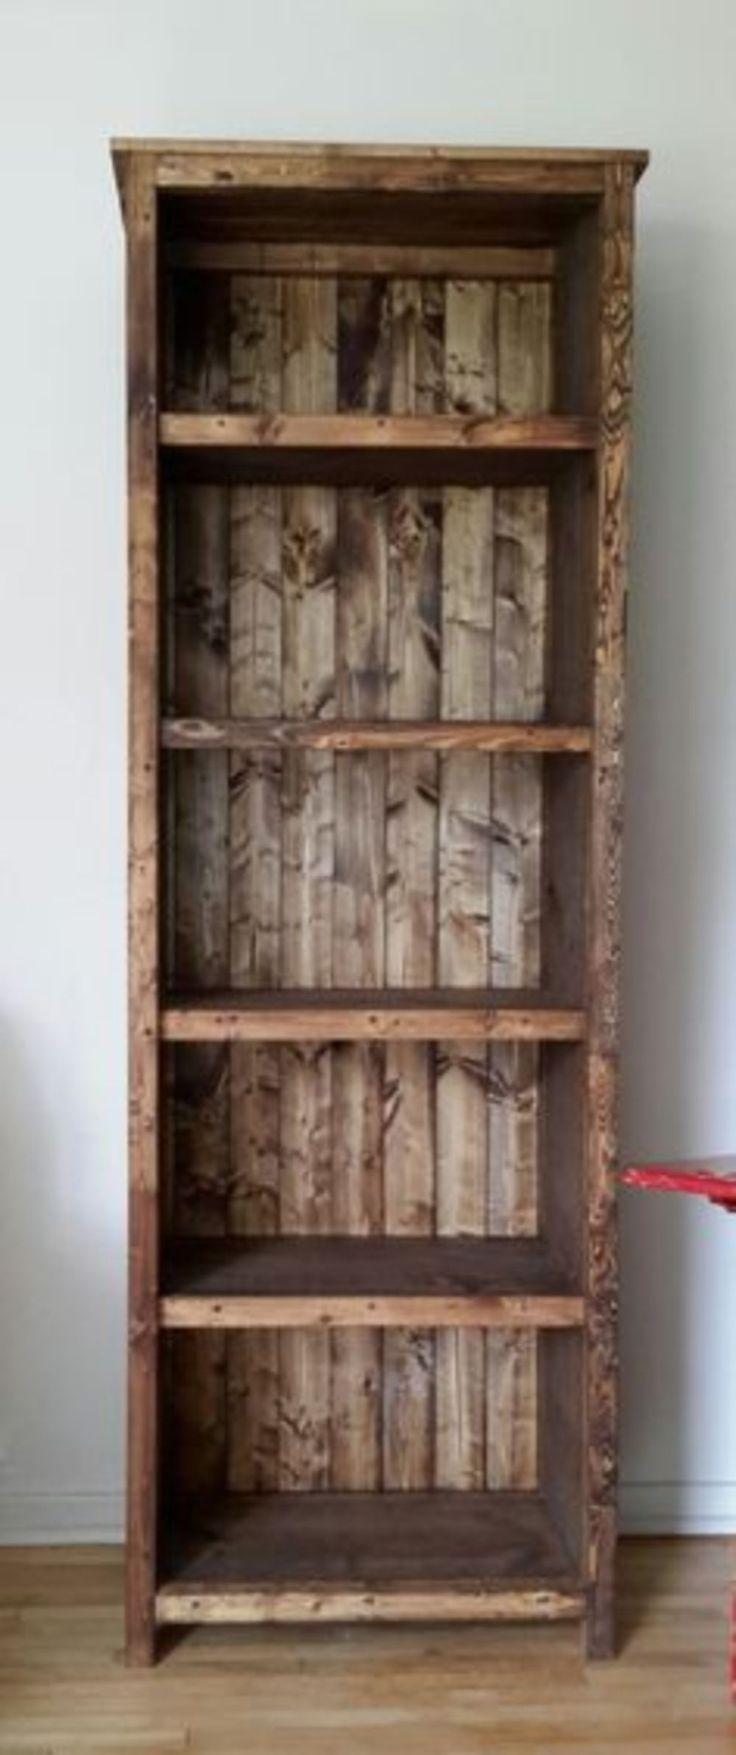 Amazing 32 DIY Rustic Wood Furniture Ideas https://cooarchitecture.com/2017/06/21/32-diy-rustic-wood-furniture-ideas/